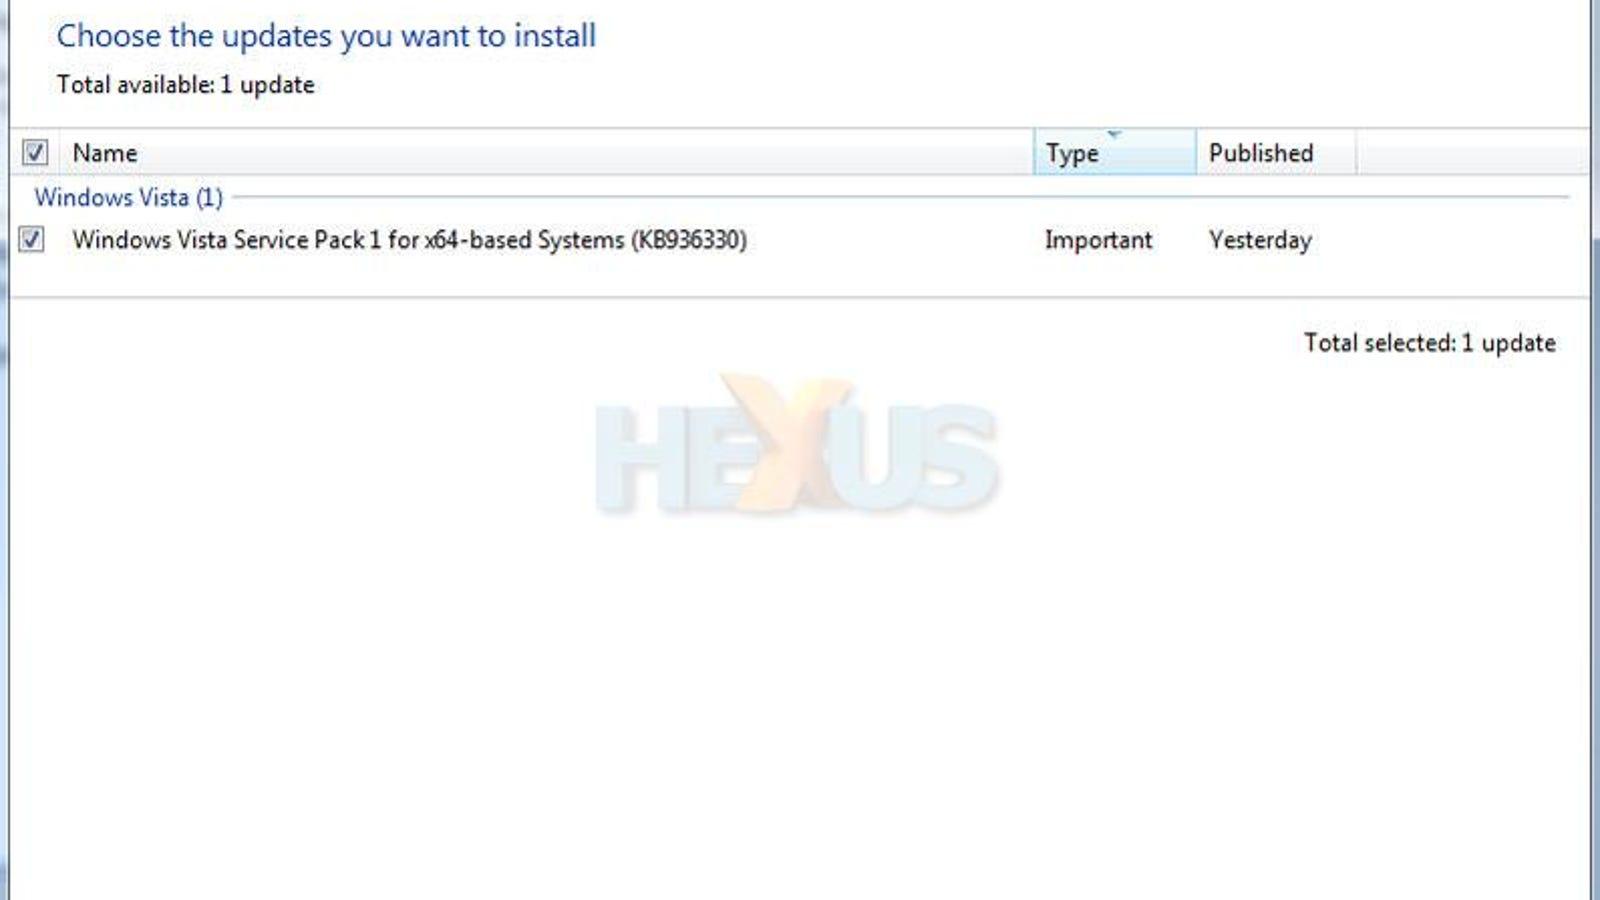 update windows vista to service pack 1